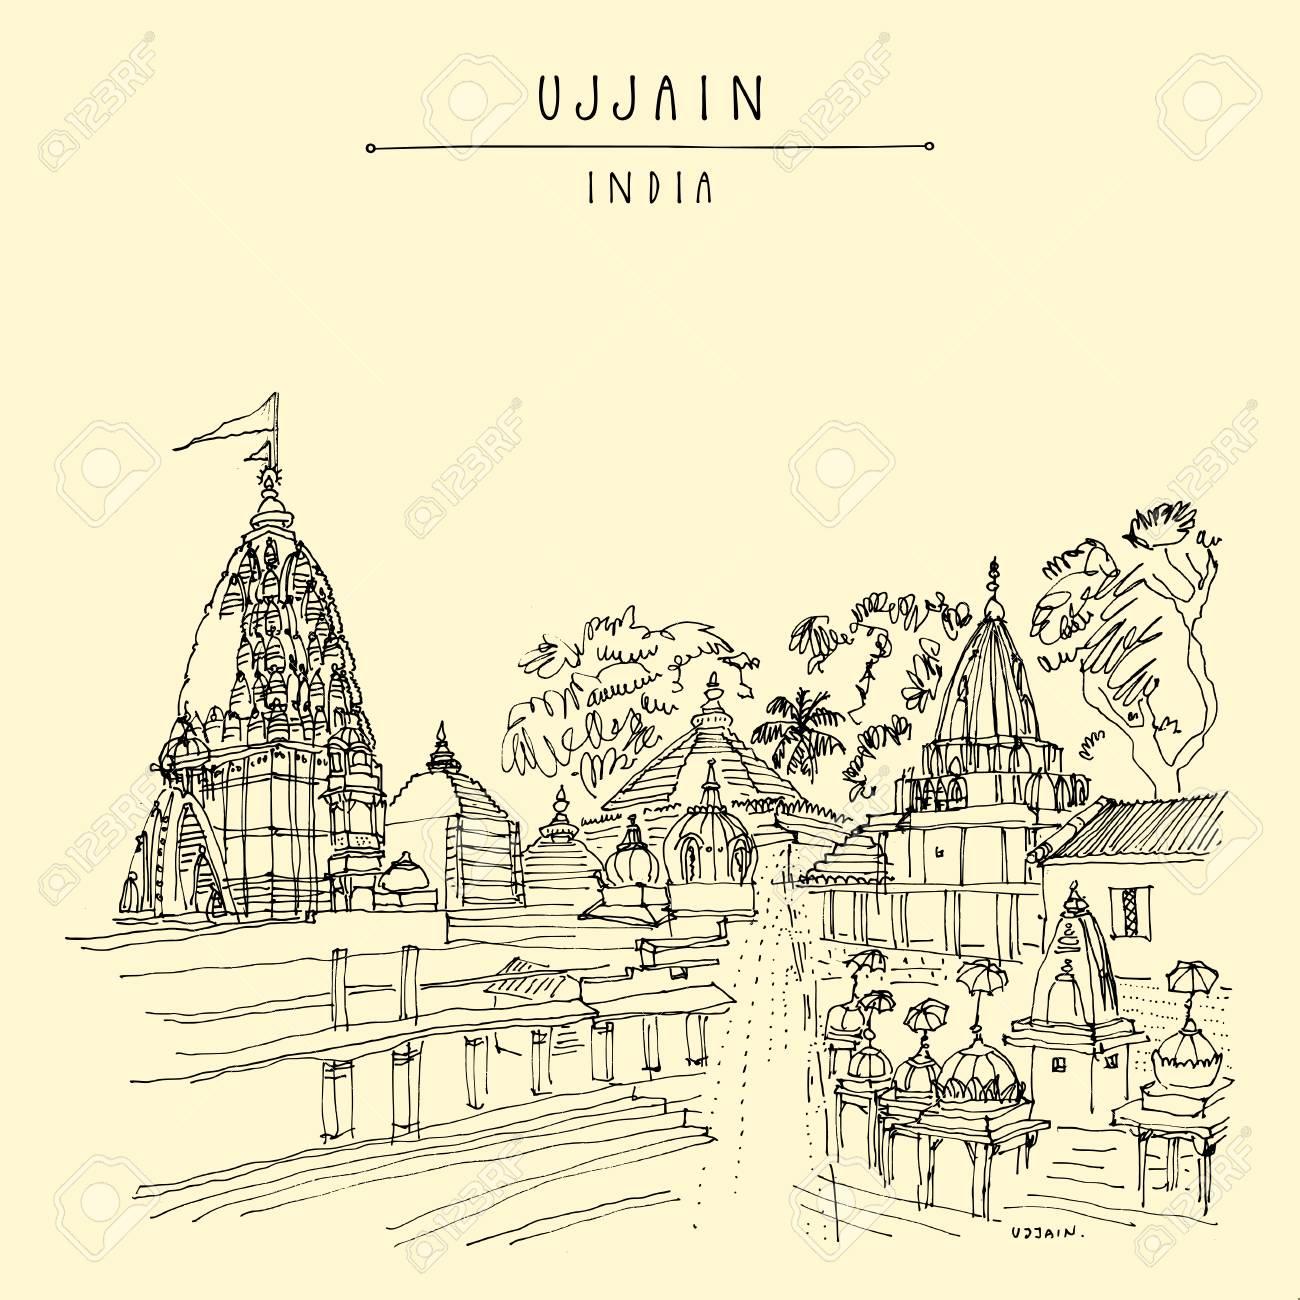 Mahakal mandir mahakaleshwar temple in holy city of ujjain madha pradesh india